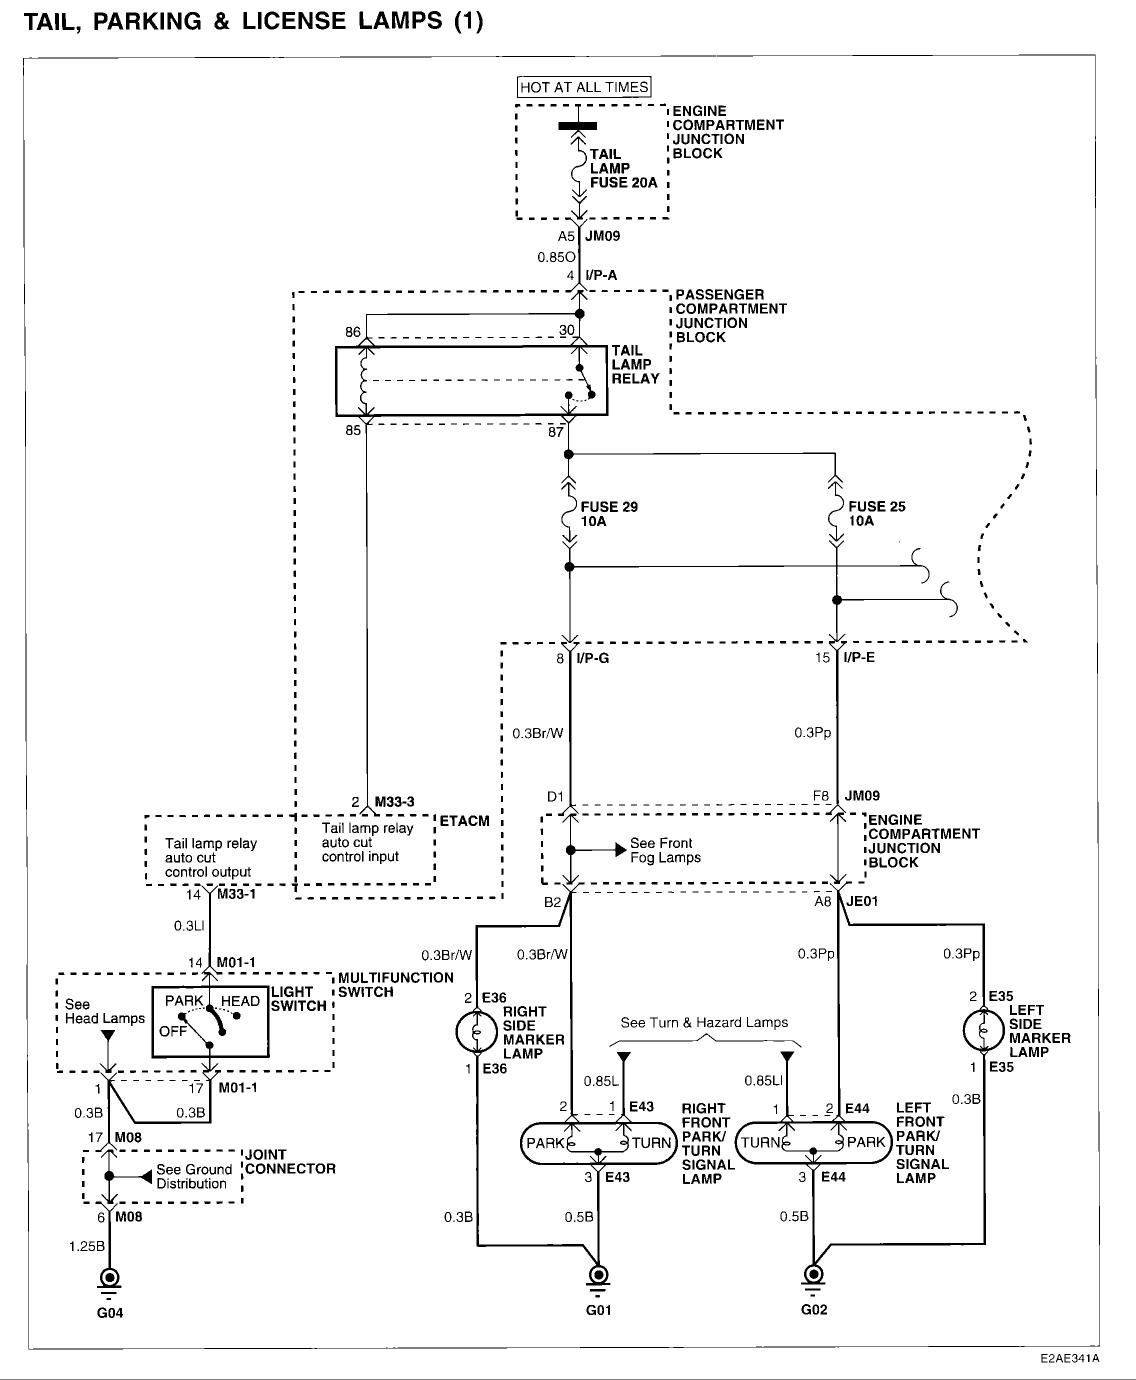 hyundai sonata wiring diagram Collection-2009 Hyundai sonata Fuse Box Diagram Inspirational sophisticated Hyundai sonata Wiring Diagram Image 5-s